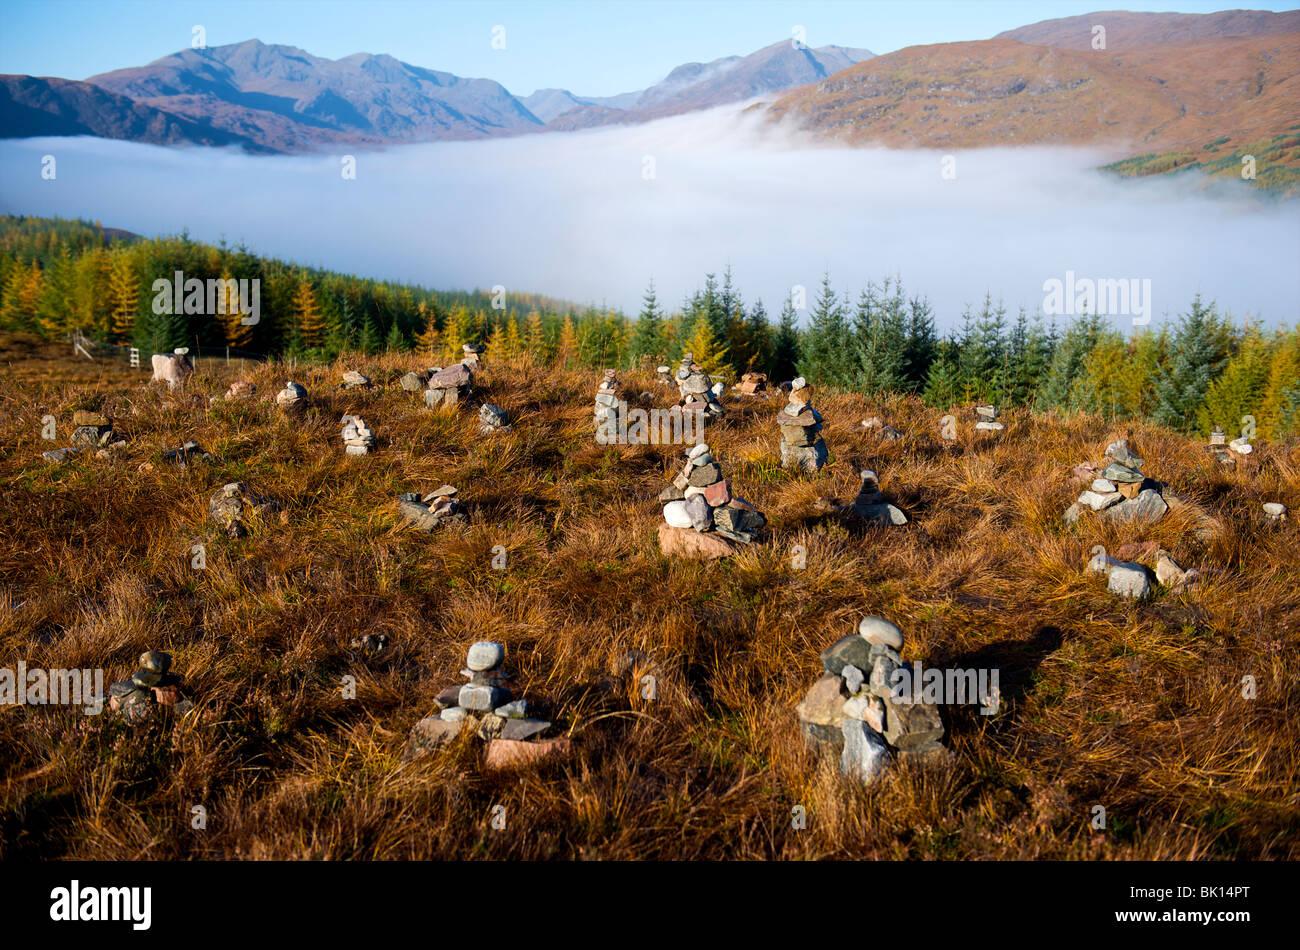 Scotland, pebbles piled together at Glenn Garry - Stock Image